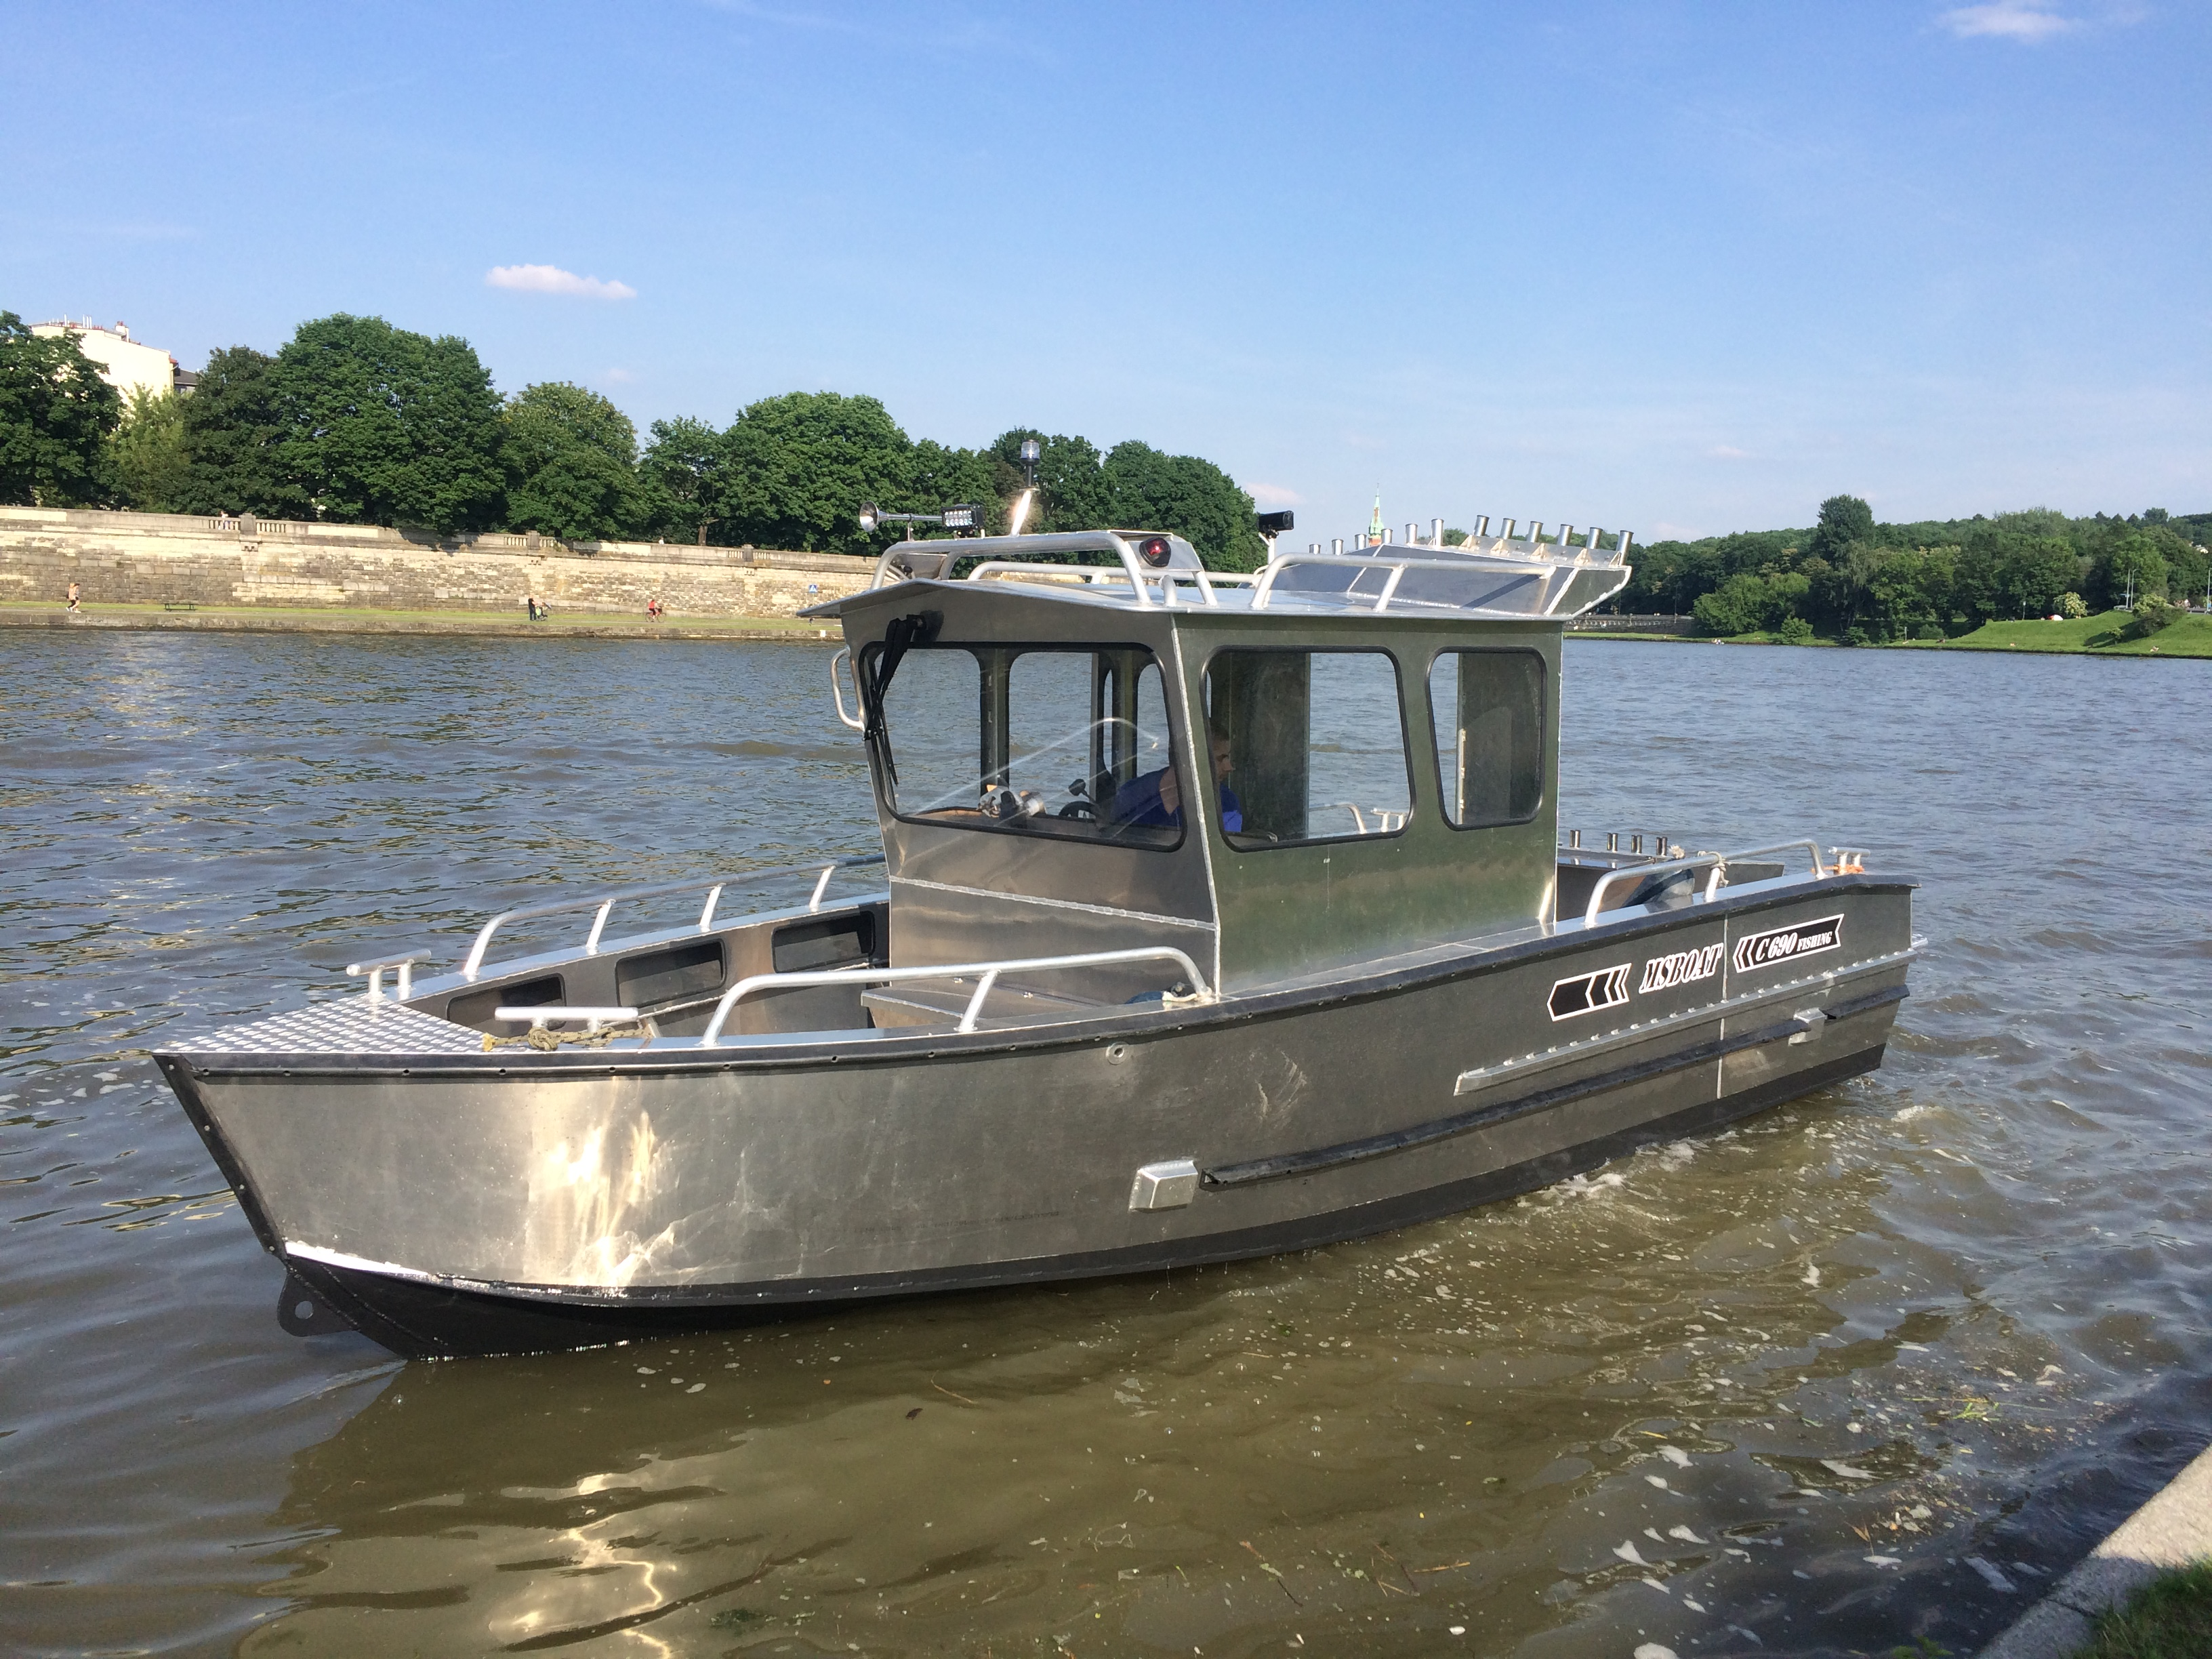 MS Boat :: Home aluminium, work boat, landing craft